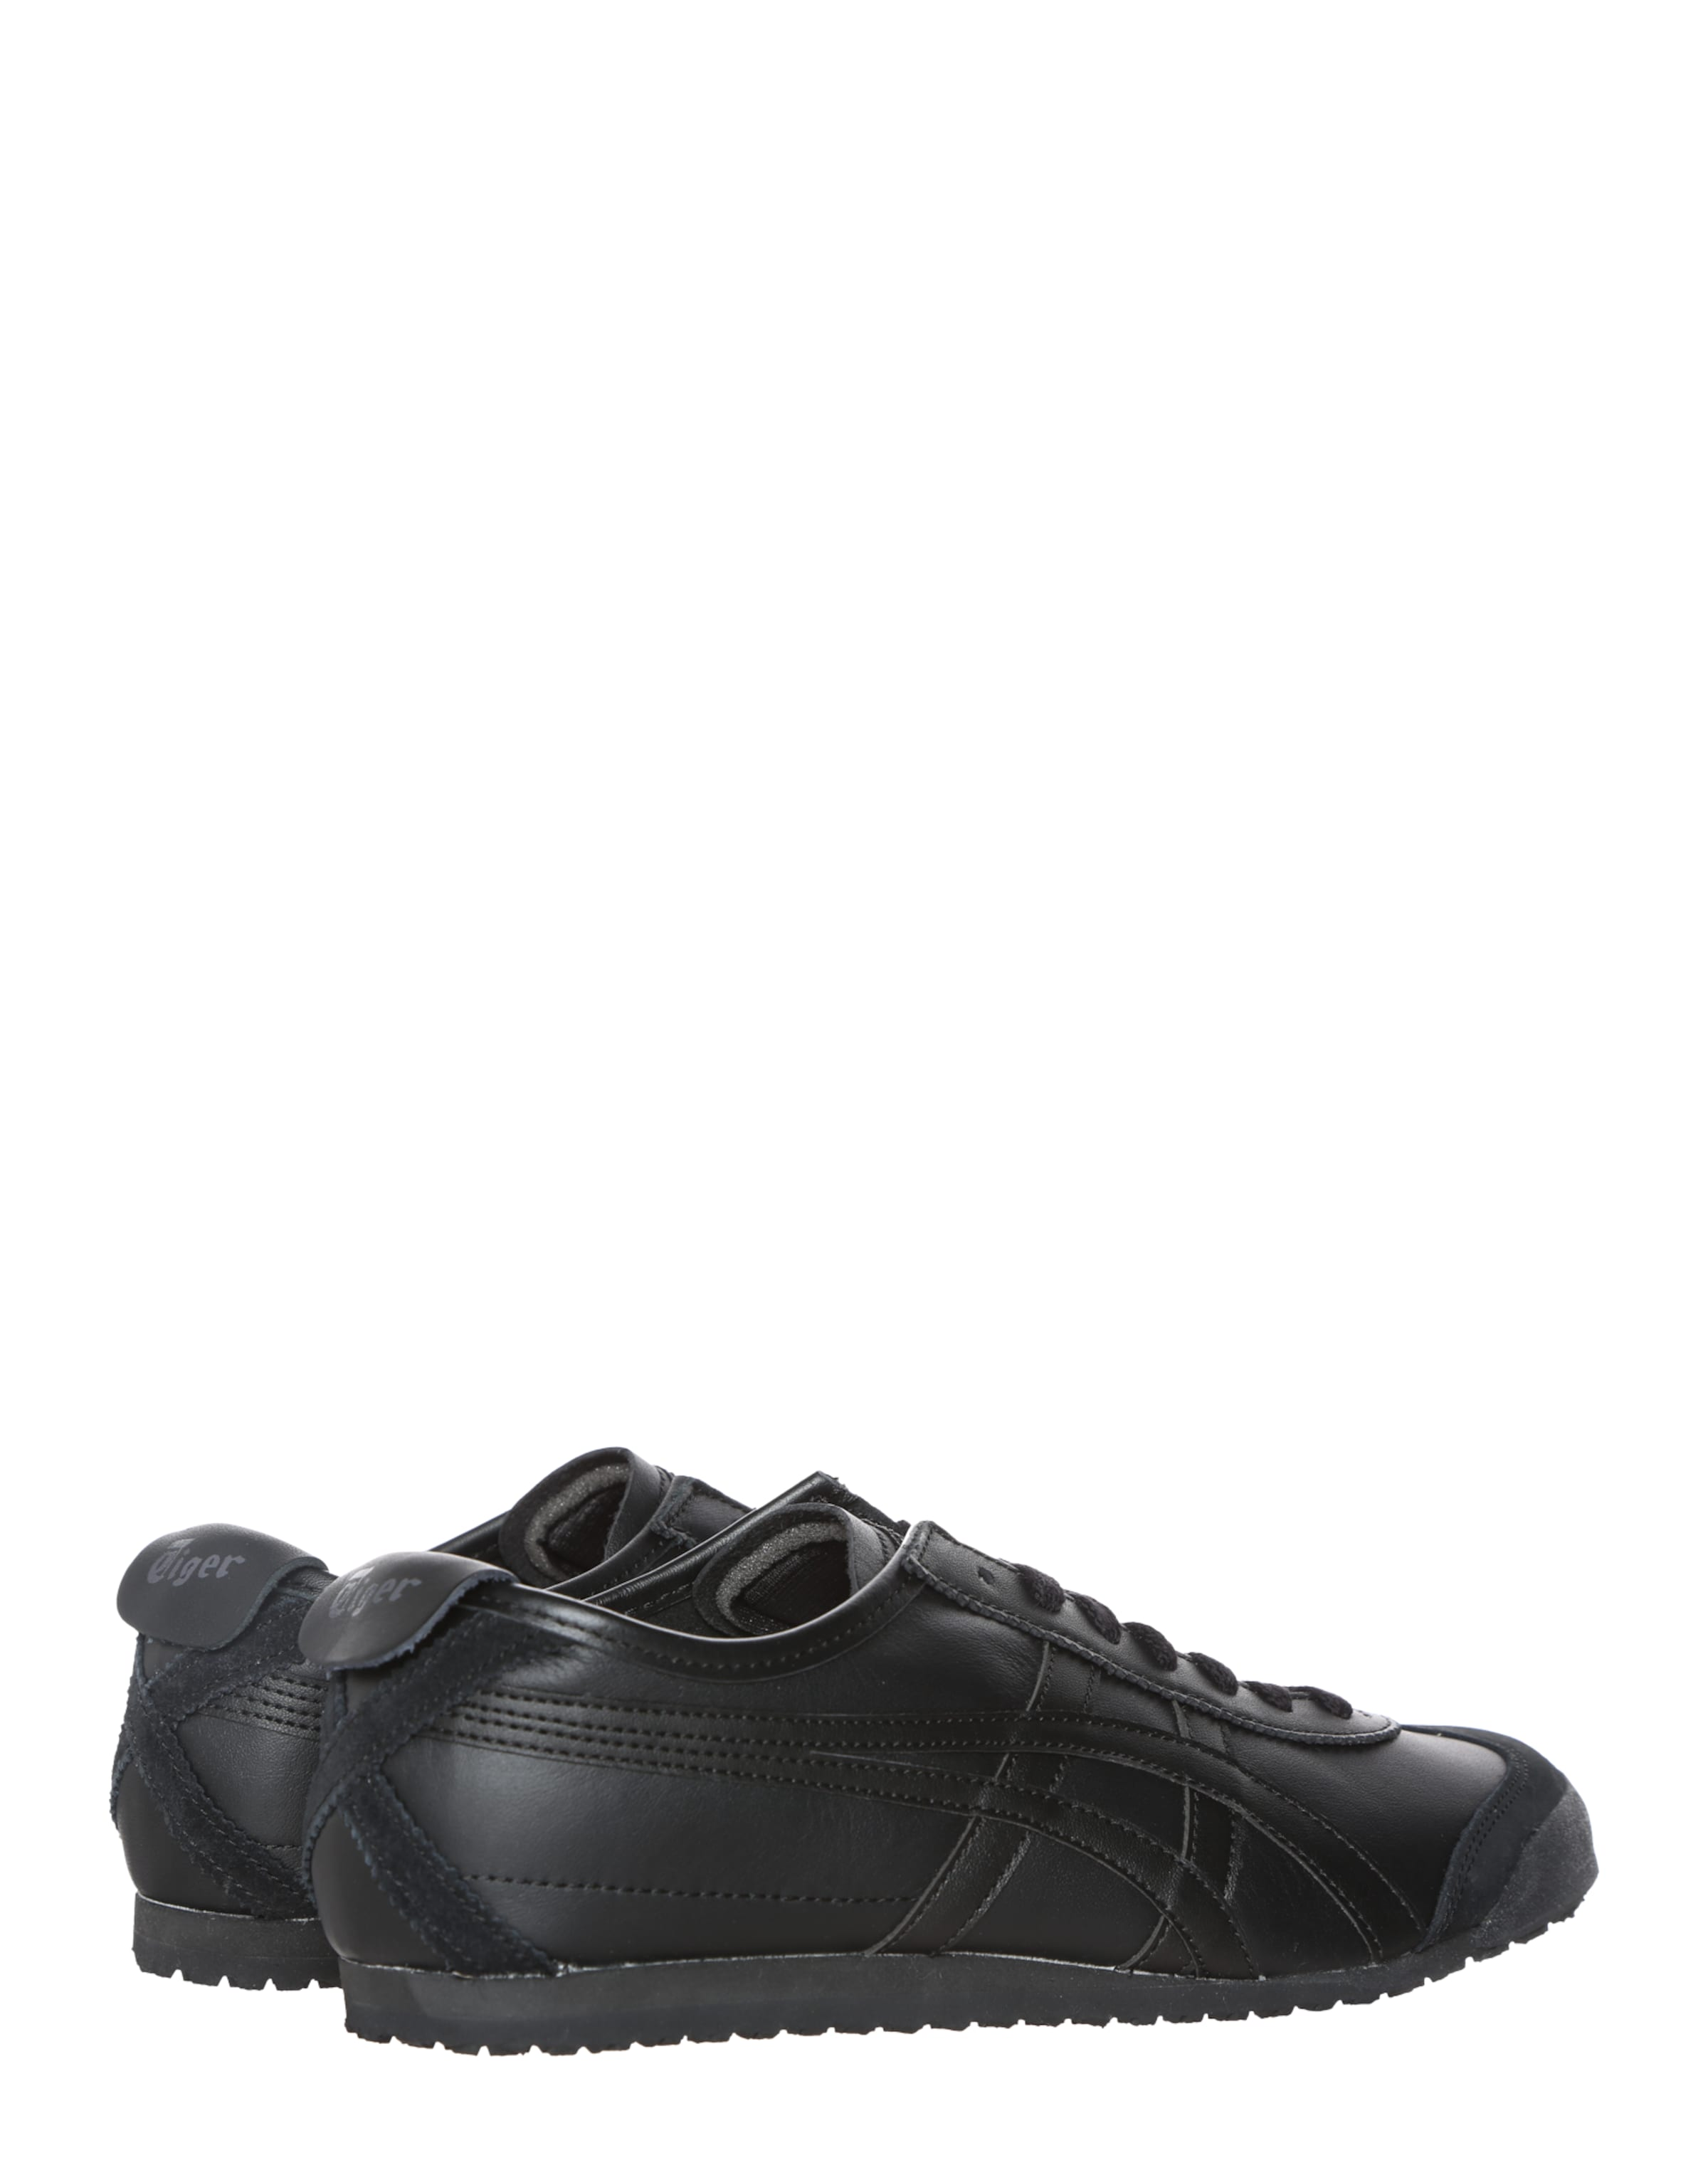 Tiger Low 'mexico In Schwarz Sneaker 66' Onitsuka u1lFJc3TK